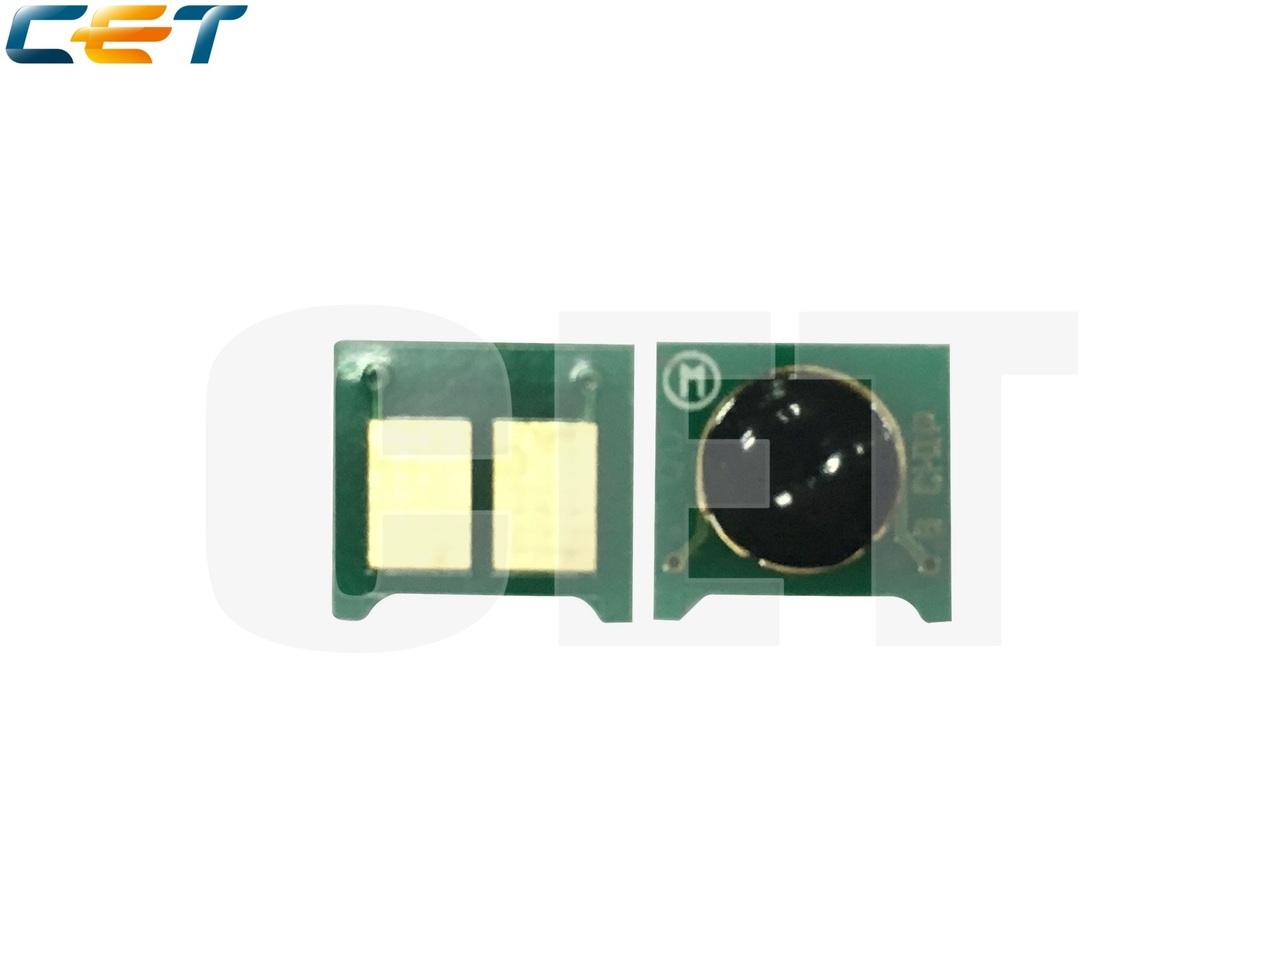 Чип картриджа CB436A, CE285A, CE278A, CC364X, CE255X,CE505X для HP LaserJetP1005/P1006/P1505/P2035/P2055/P4015/P1566/P1606/P3015(CET), (WW), (унив.), 1.5K/2K/2.1K/6.5K/12.5K/24K/5K, CET0966